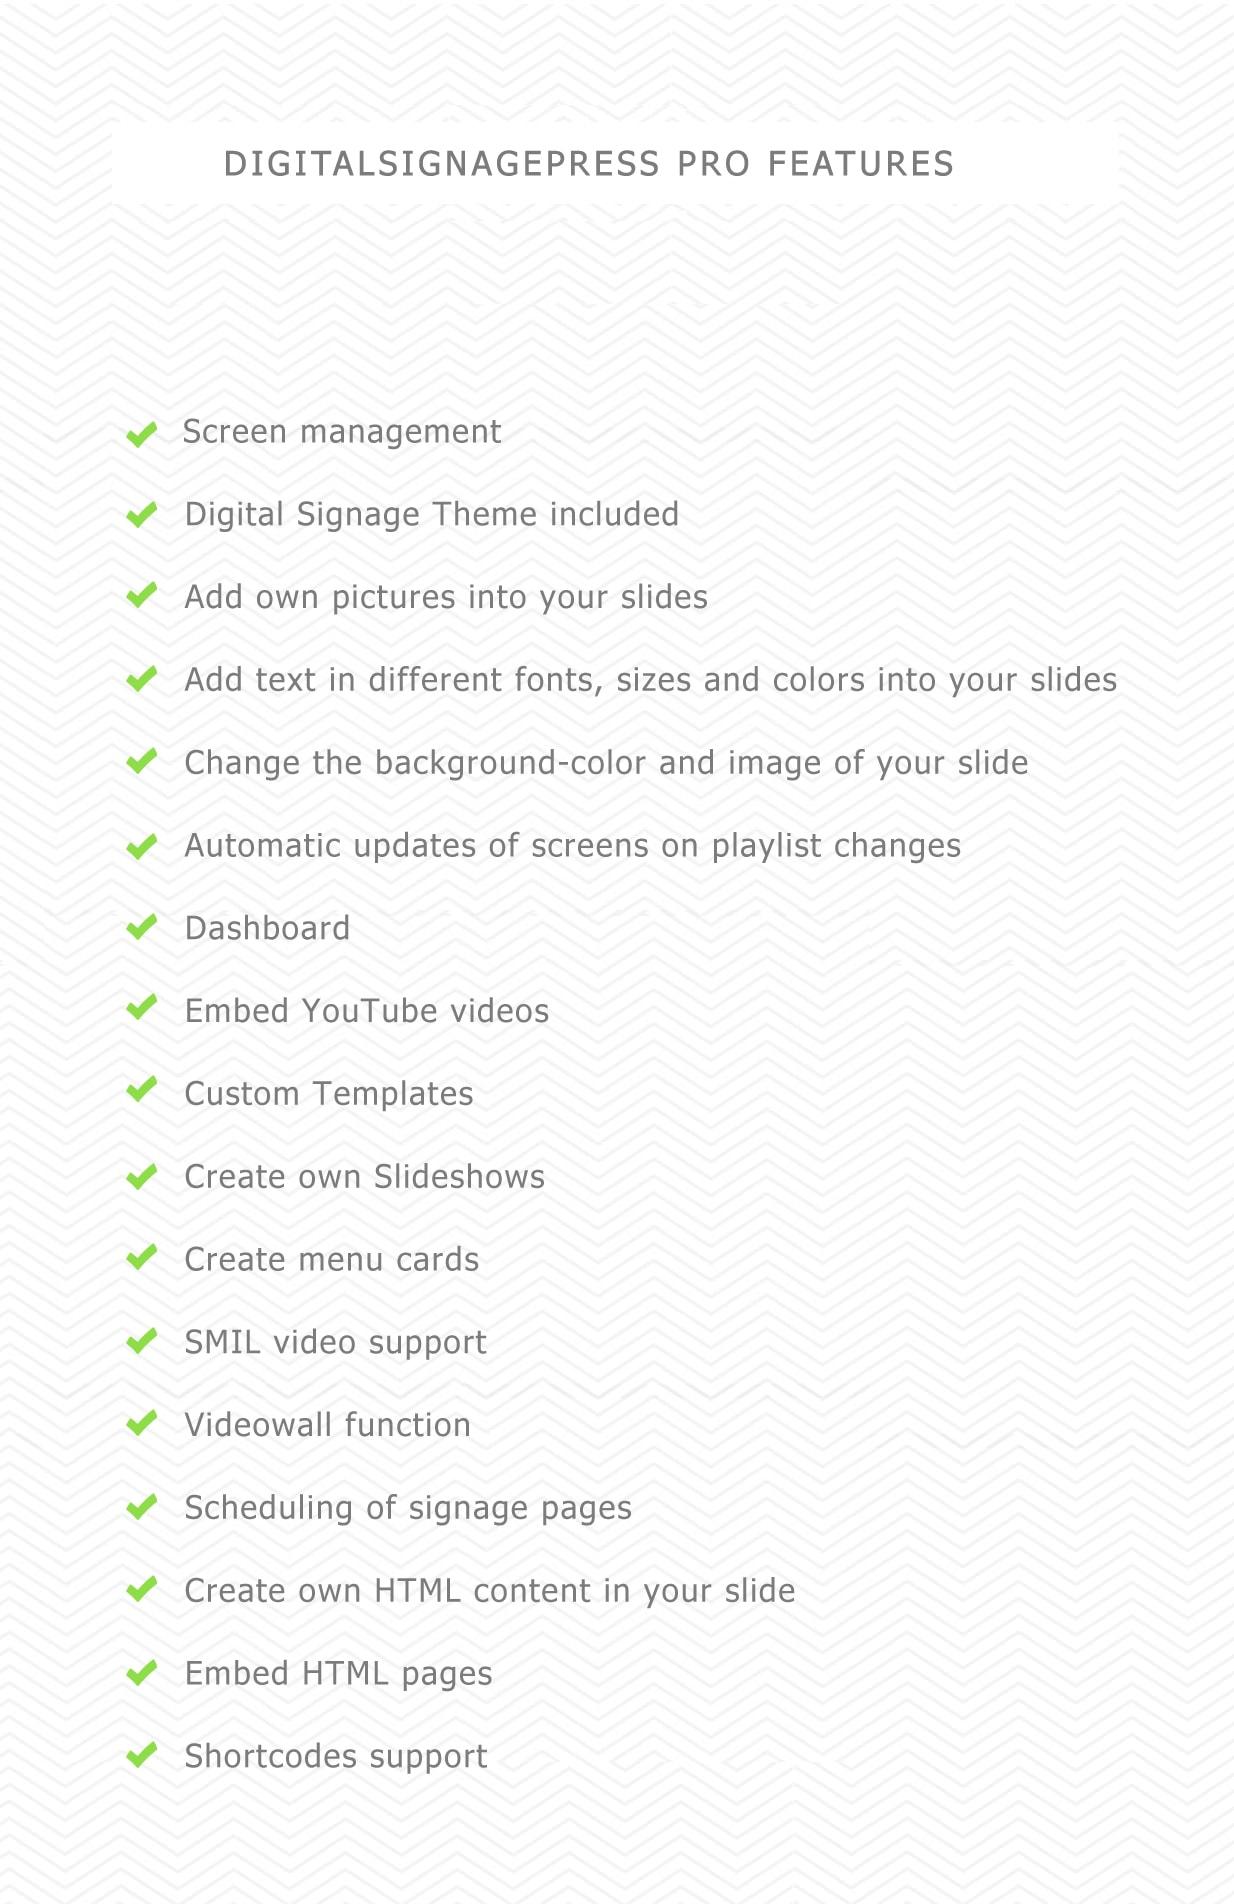 Digitalsignagepress Pro - Digital Signage WordPress Plugin